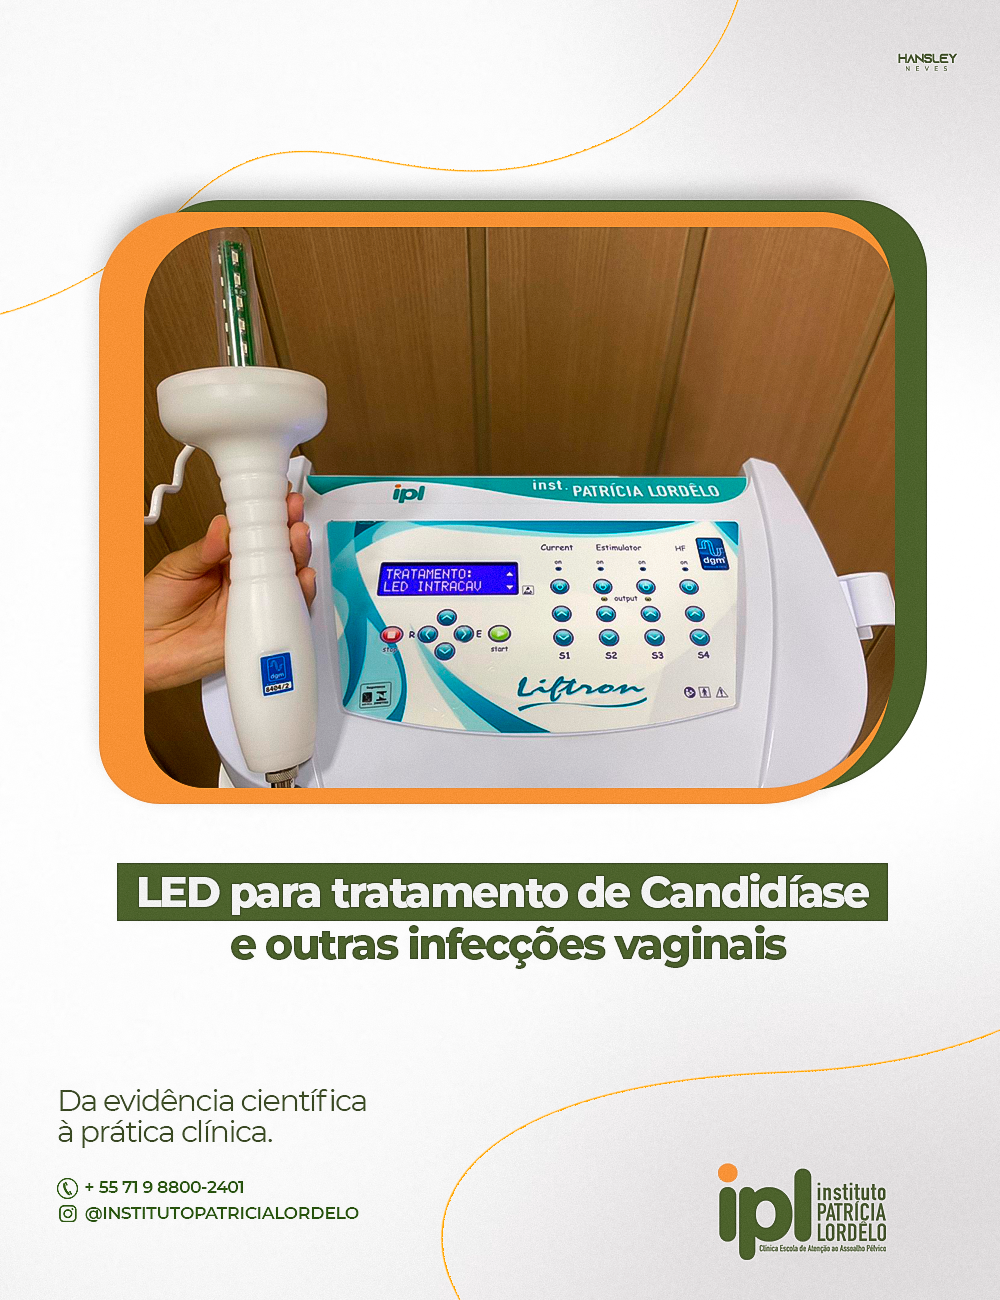 LED intravaginal